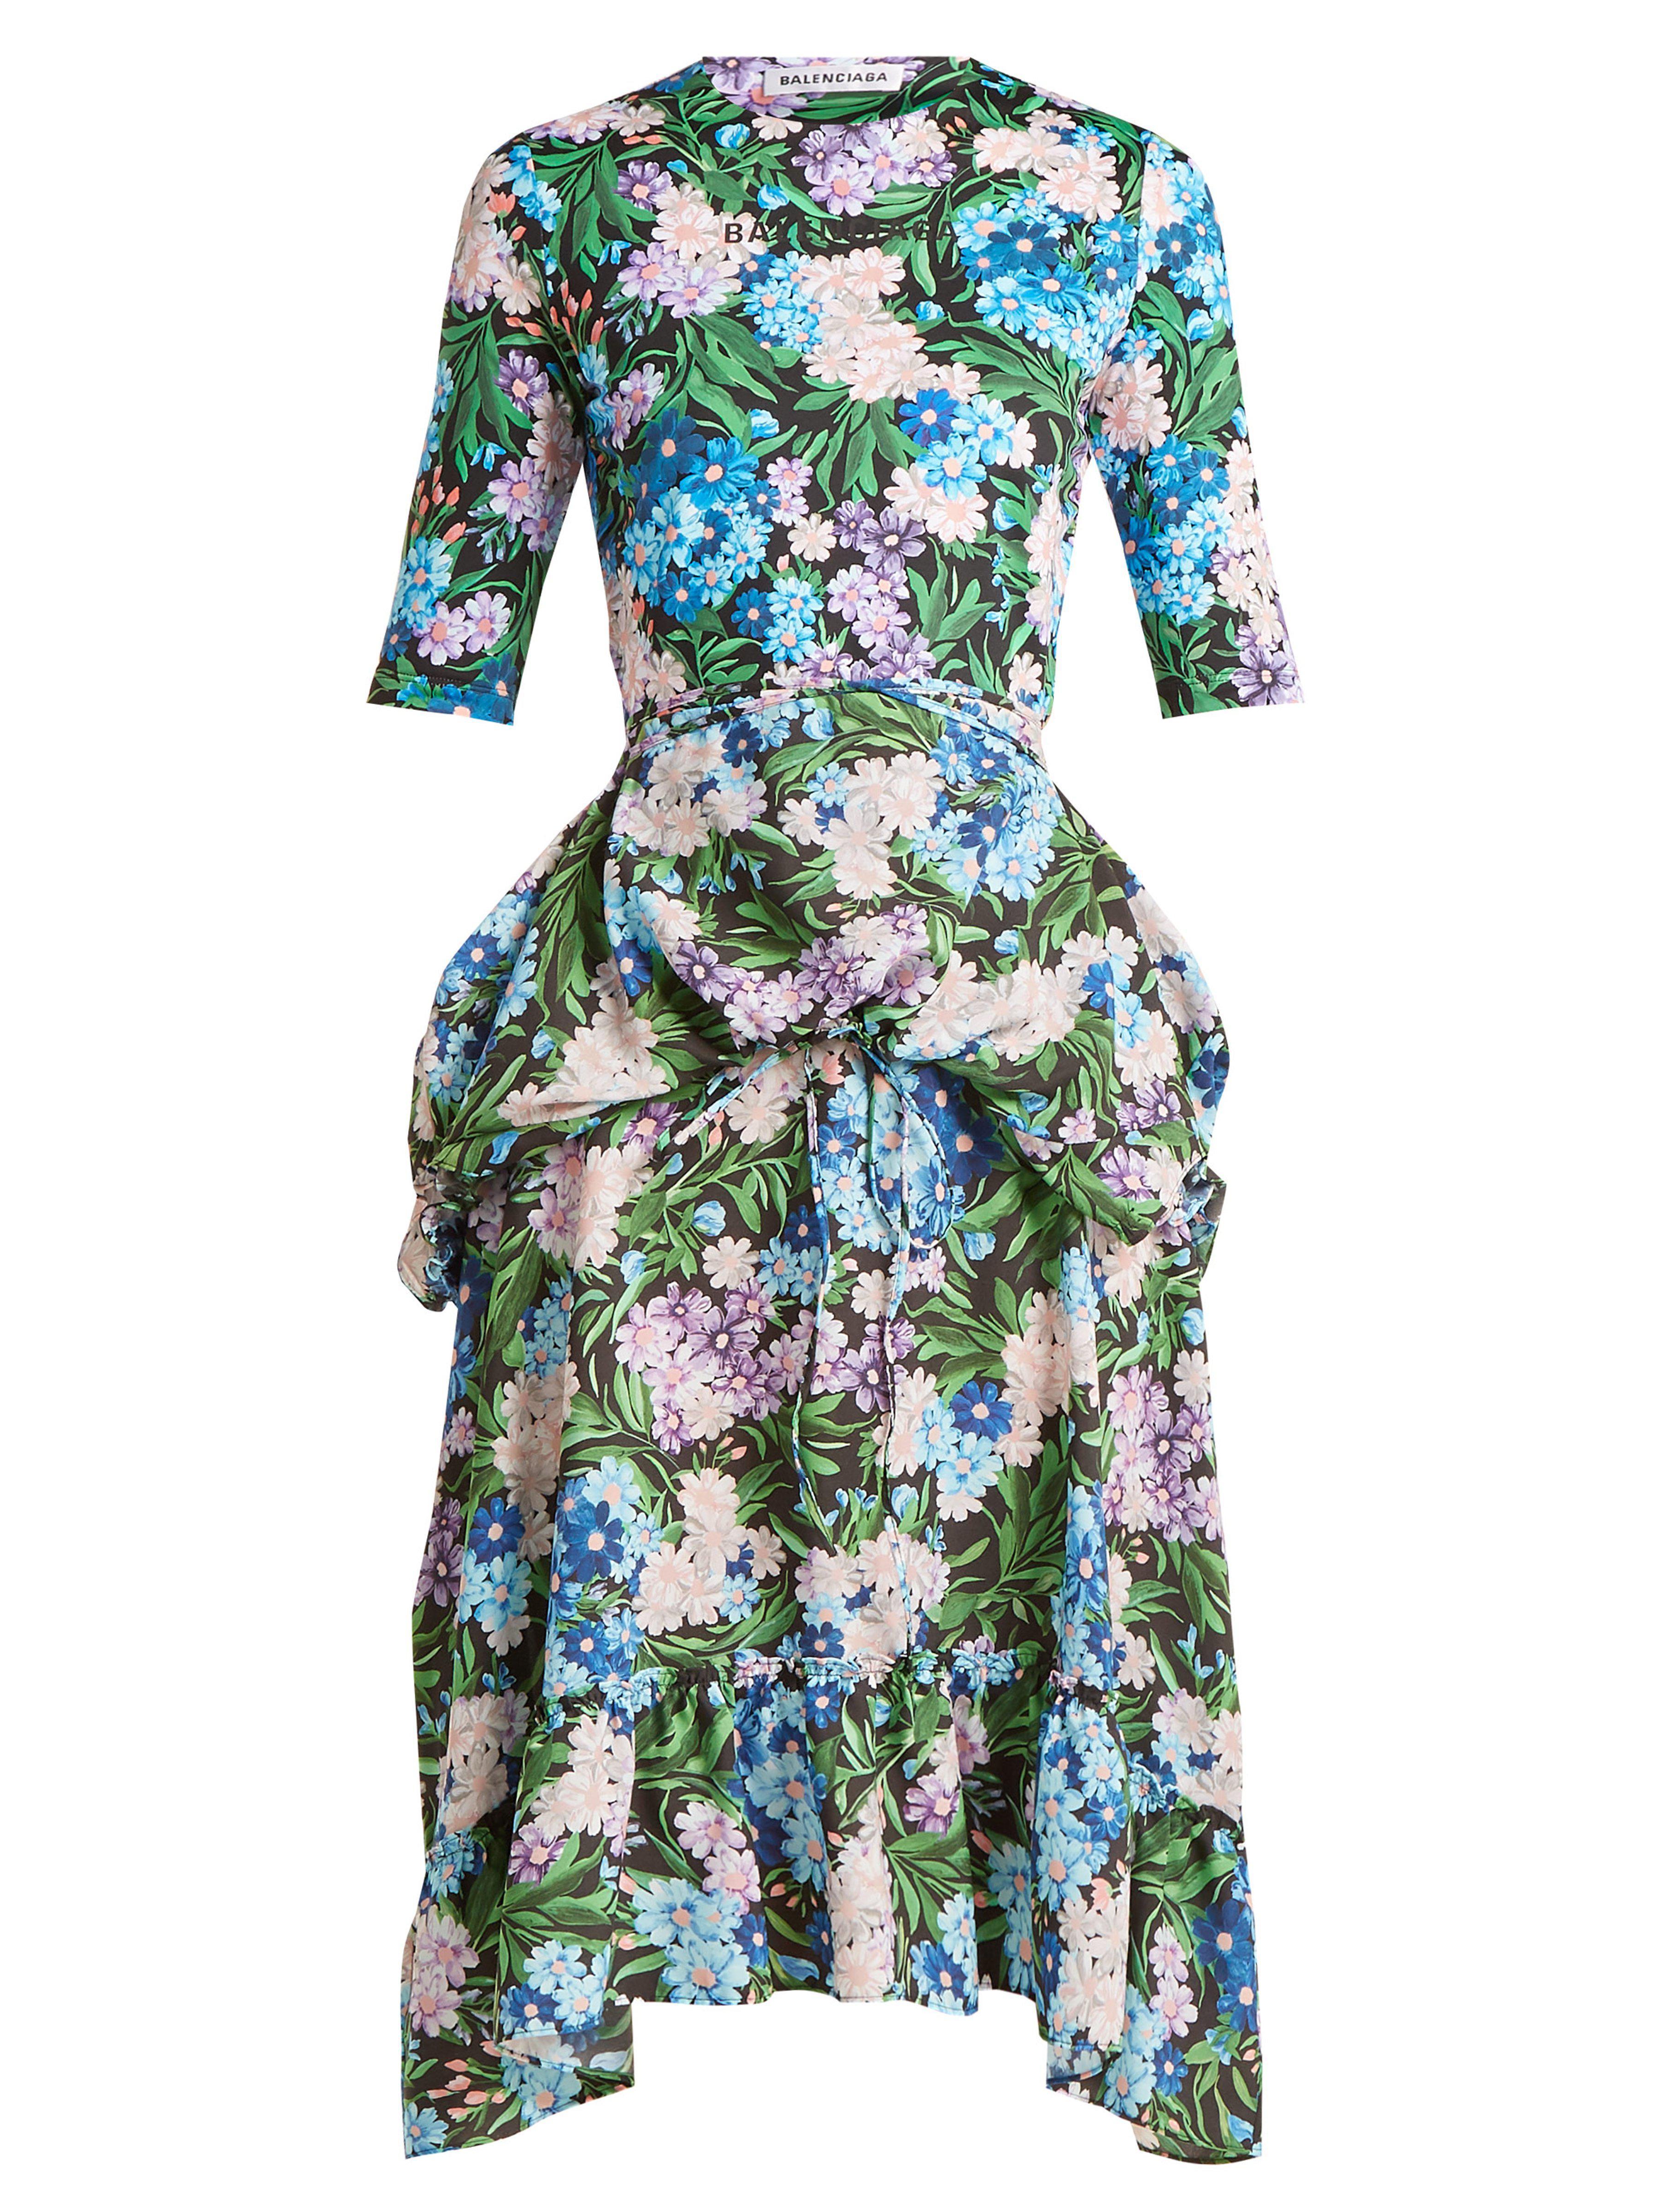 807cdf739b34 Balenciaga - Blue Floral Print Wrap Around Jersey Dress - Lyst. View  fullscreen